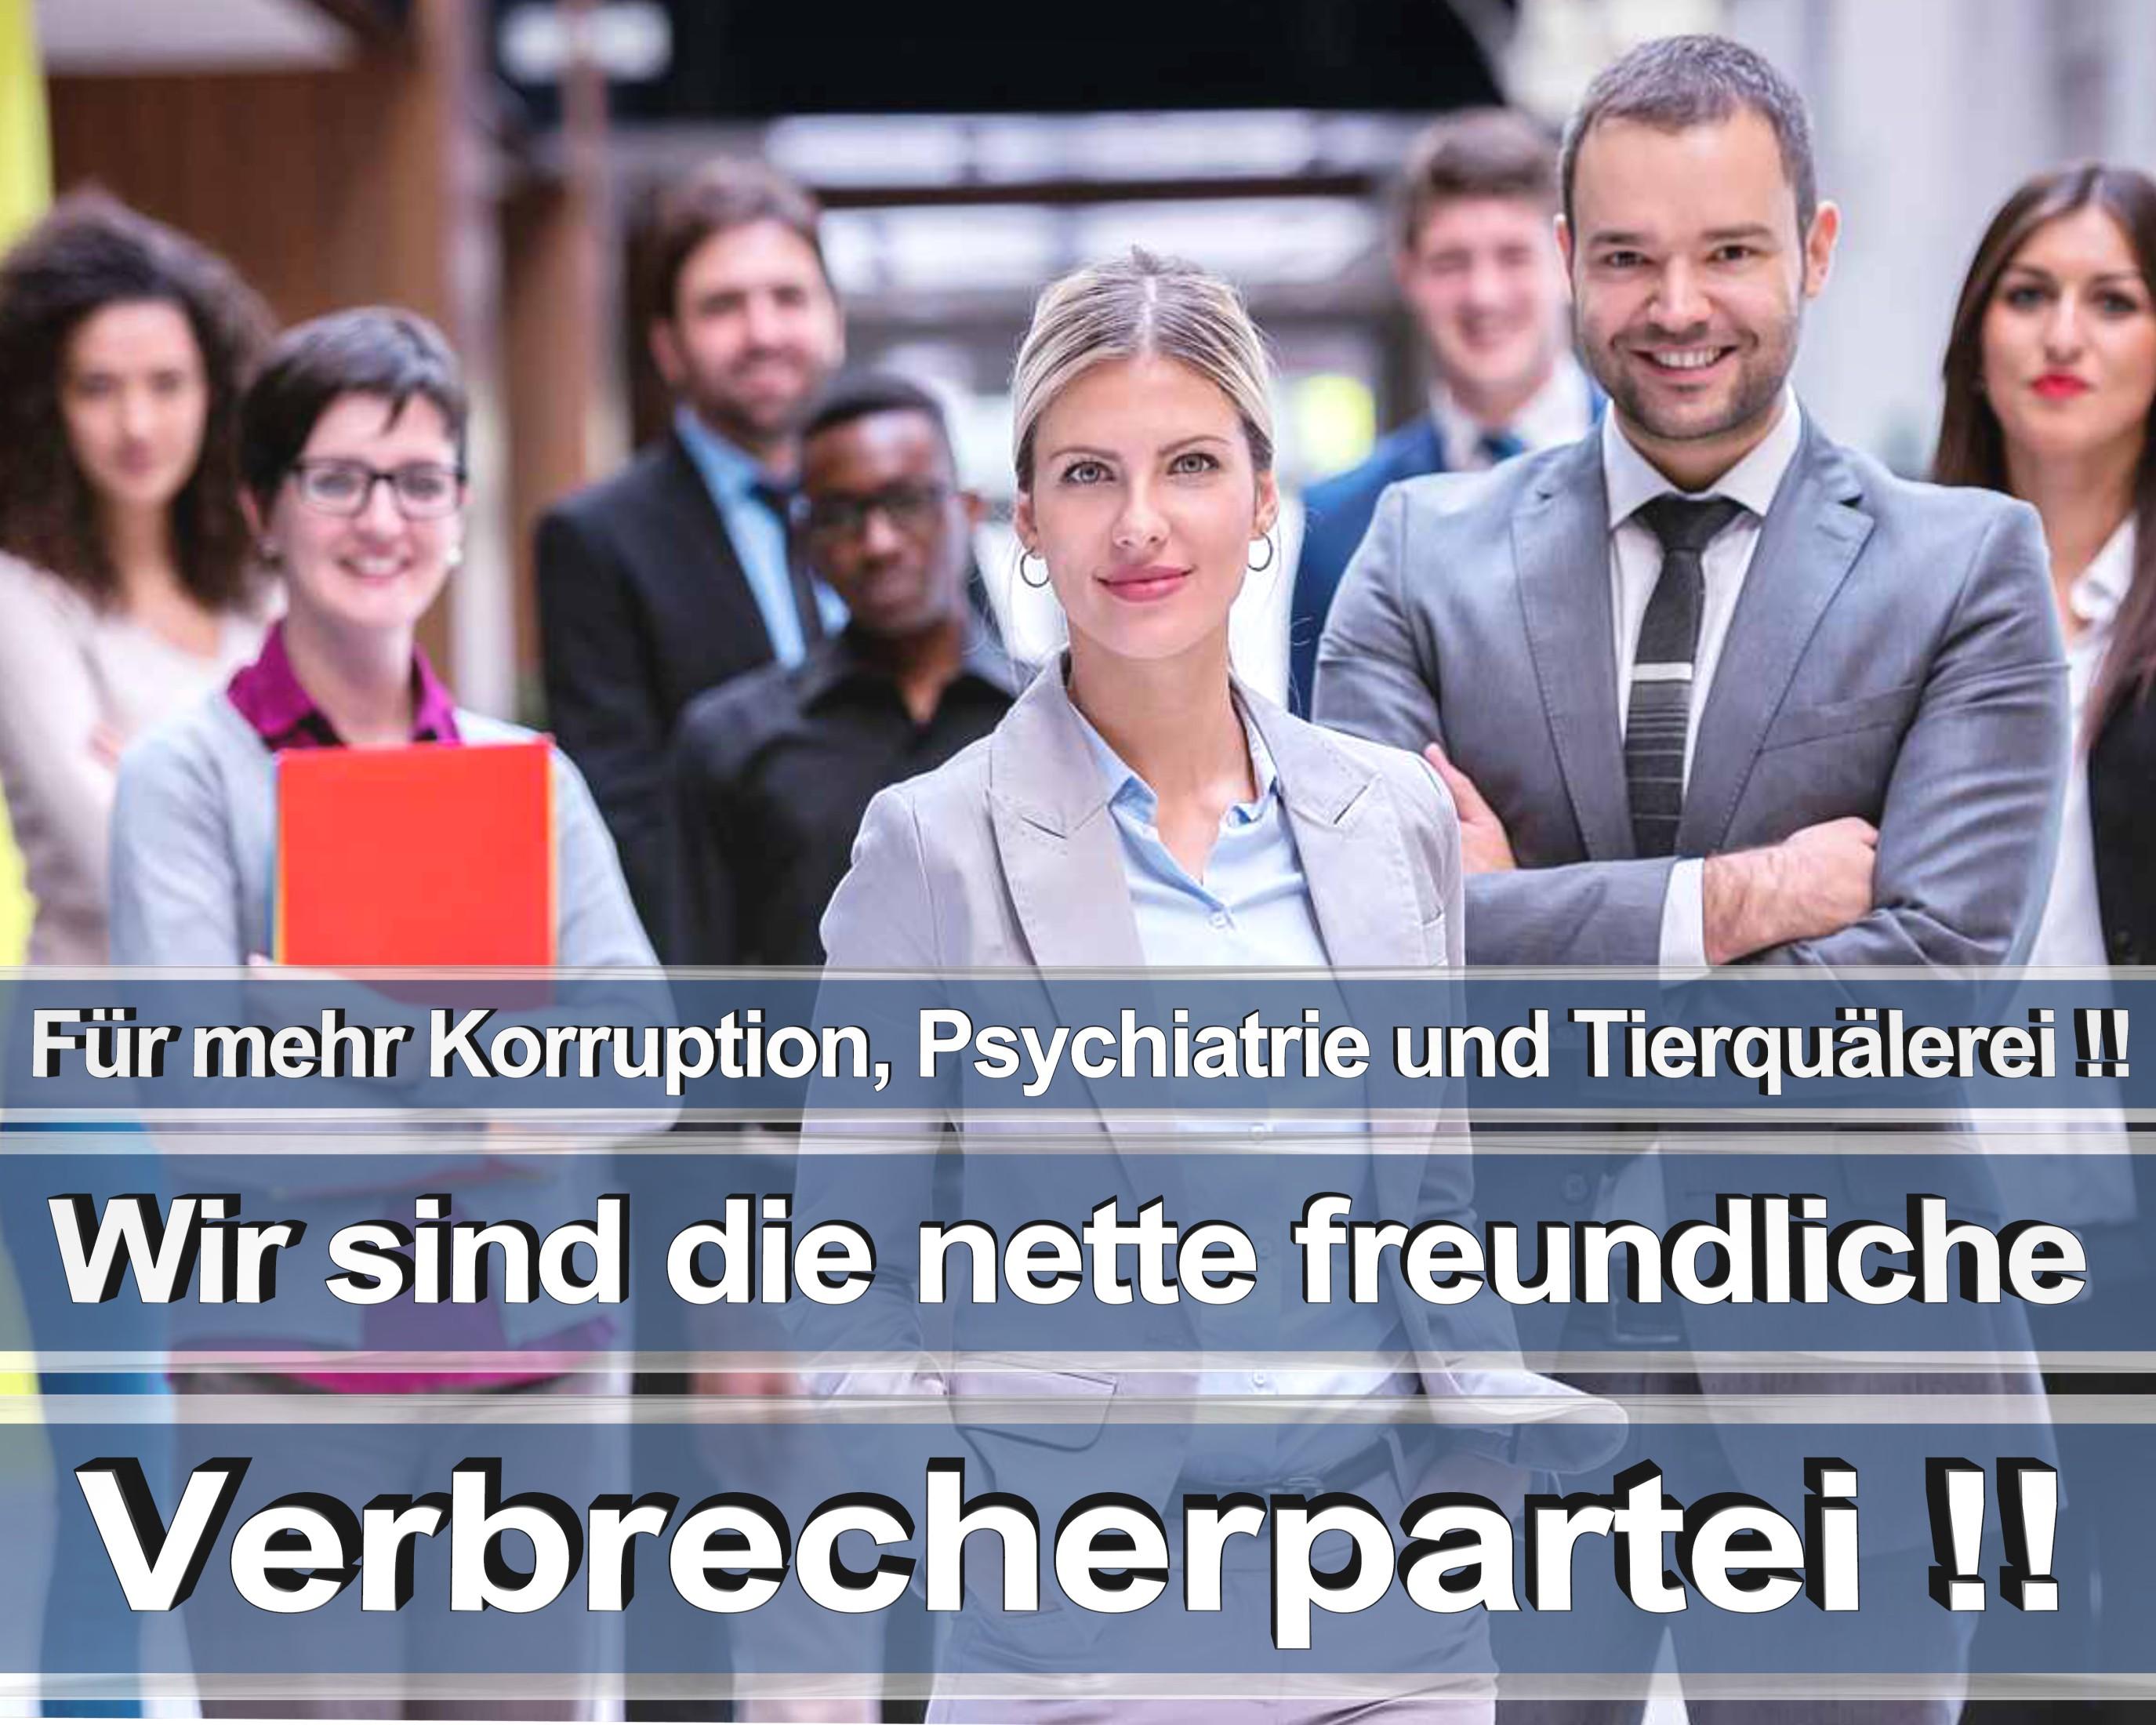 FDP Bielefeld Jan Maik Schlifter, Jasmin Wahl Schwentker, Jens Andernacht, Laura Schubert, Dr Klaus Schleicher, Rainer Seifert